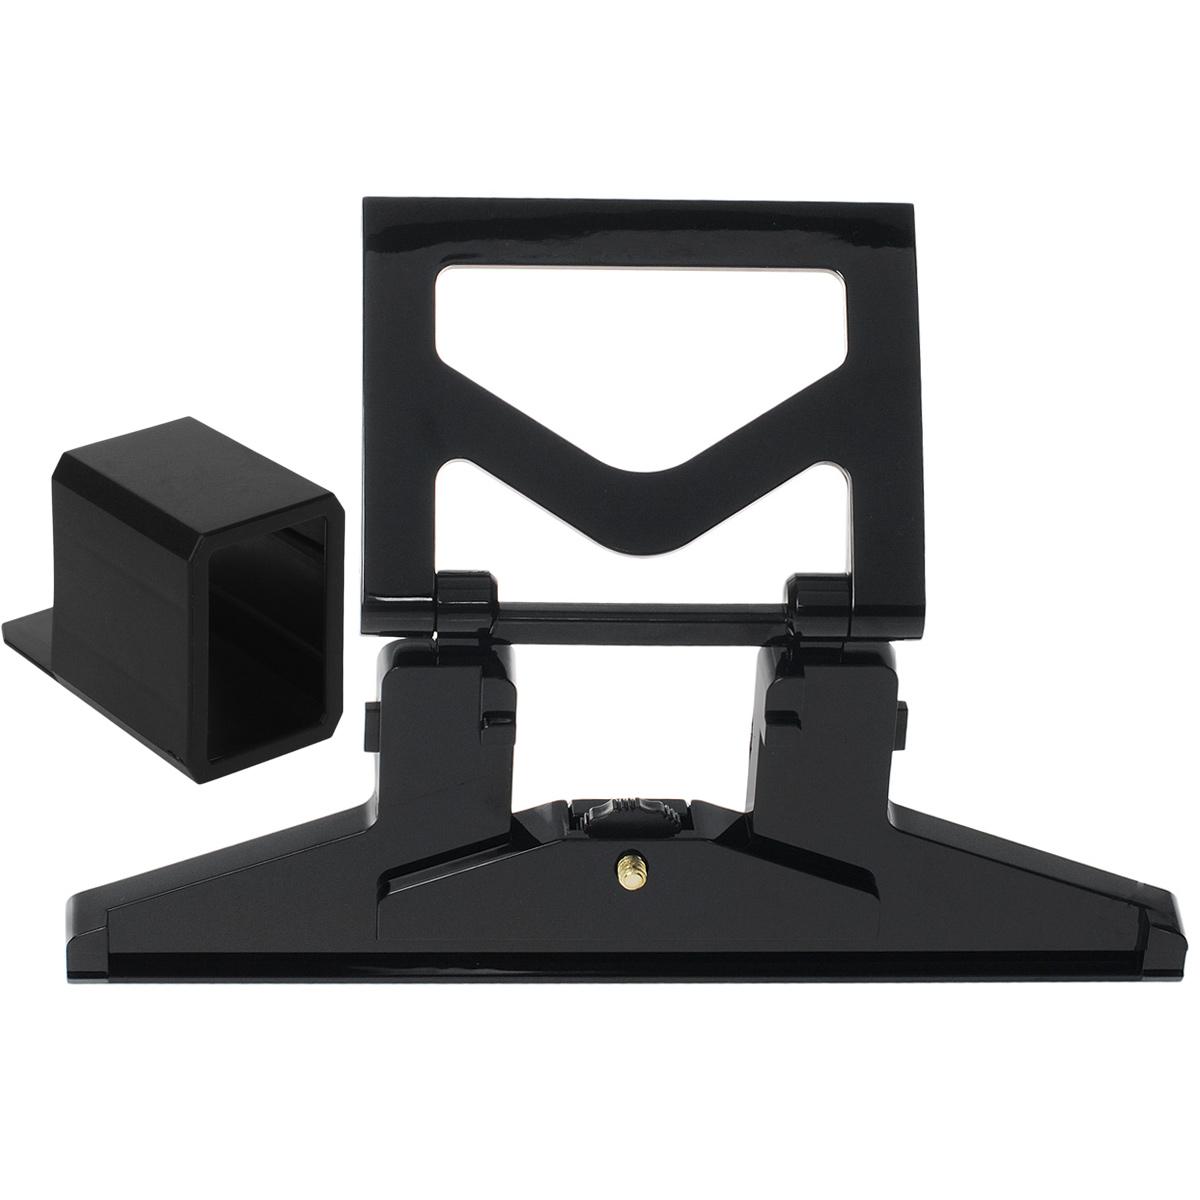 Крепление на телевизор Black Horns для Kinect Xbox One kinect sports ultimate collection только дляkinect [xbox360]